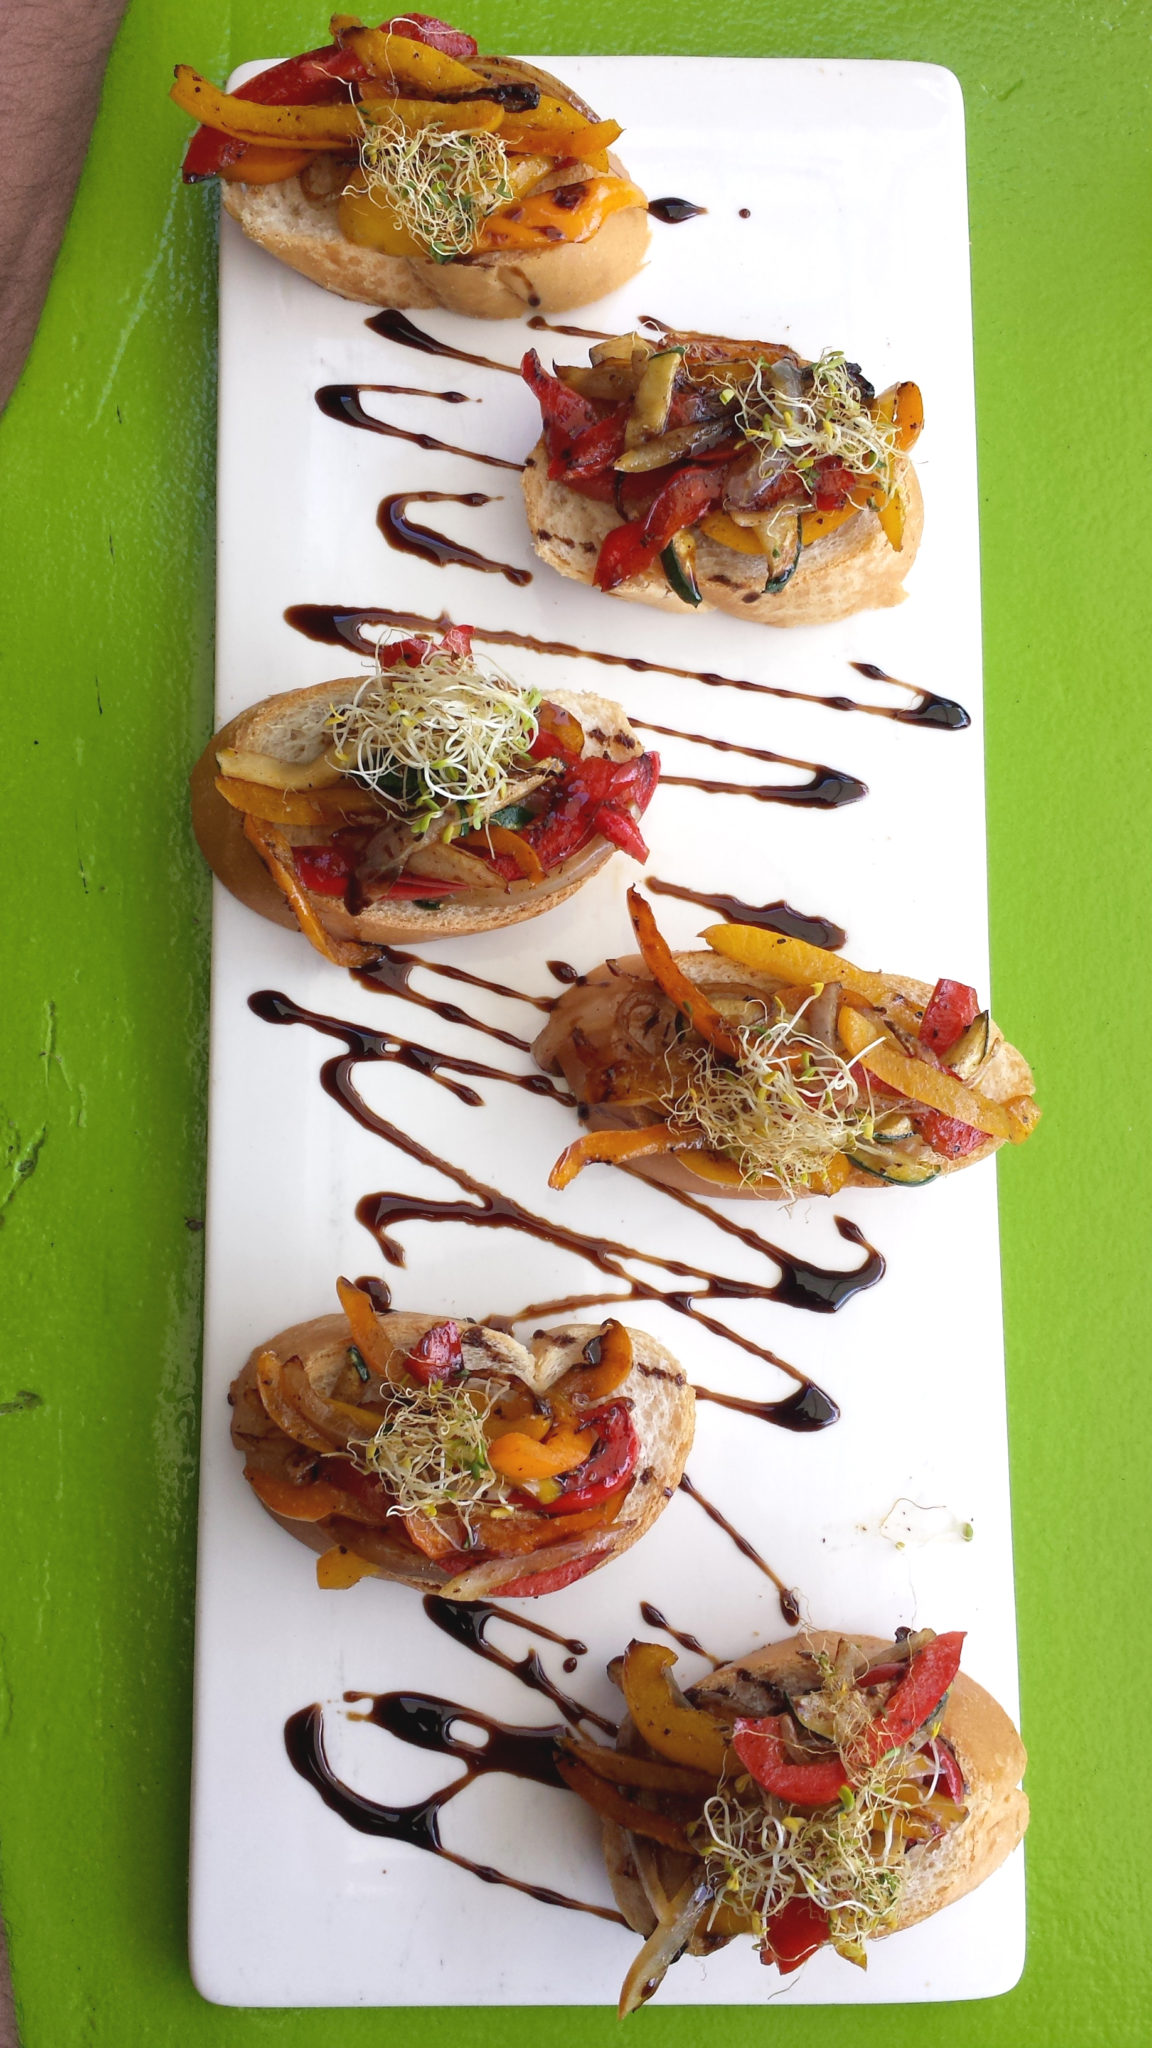 Republique_dominicaine_mes_bonnes_adresses_bayahibe_restaurant_saona_cafe_bruschetta